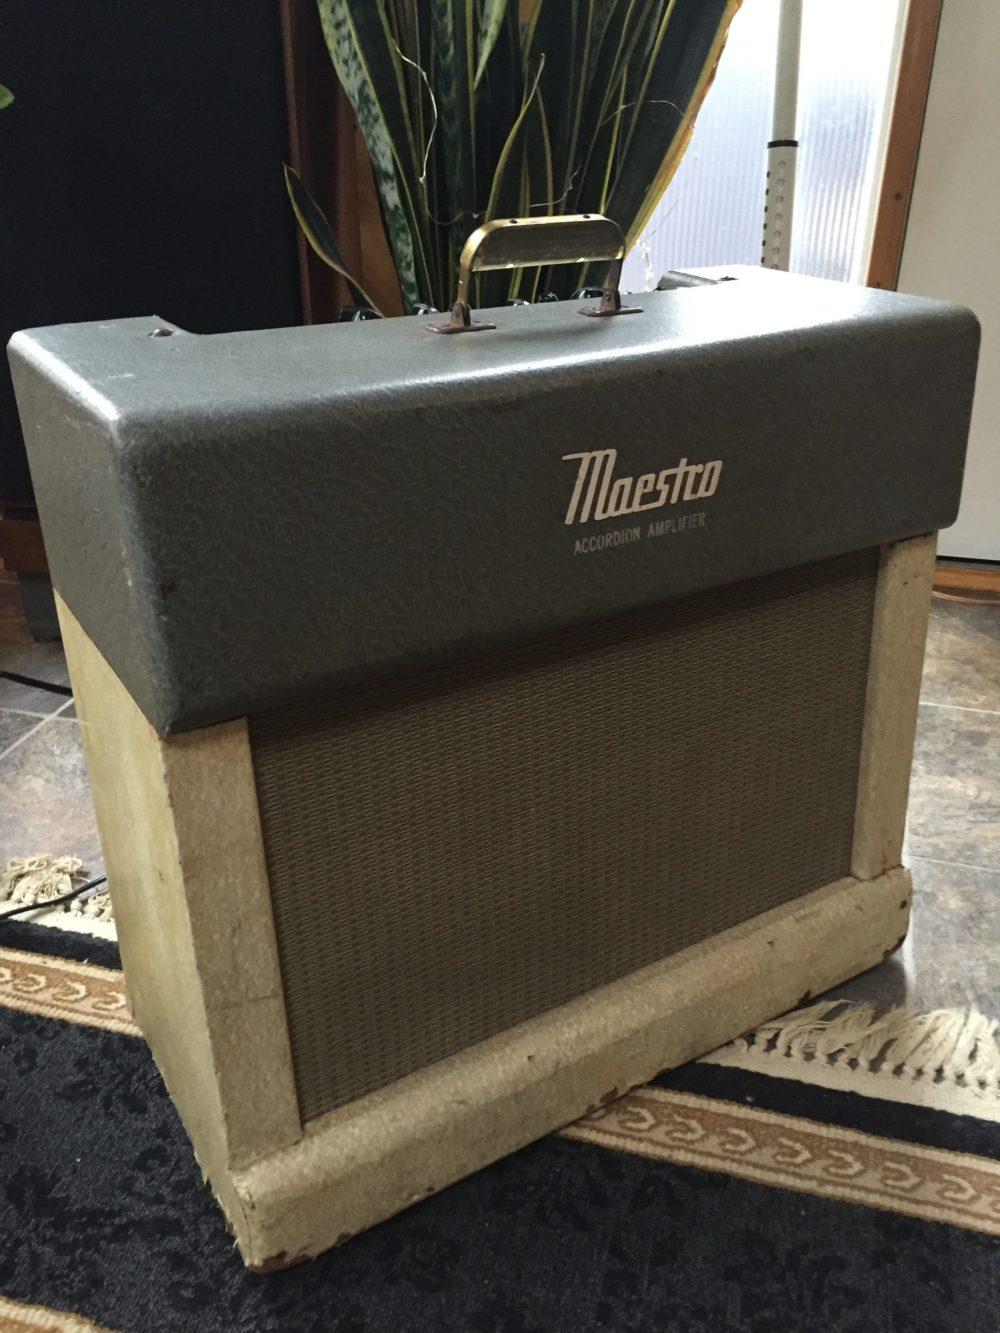 Live: Using Tremolo on my Gibson GA 45T (Maestro)